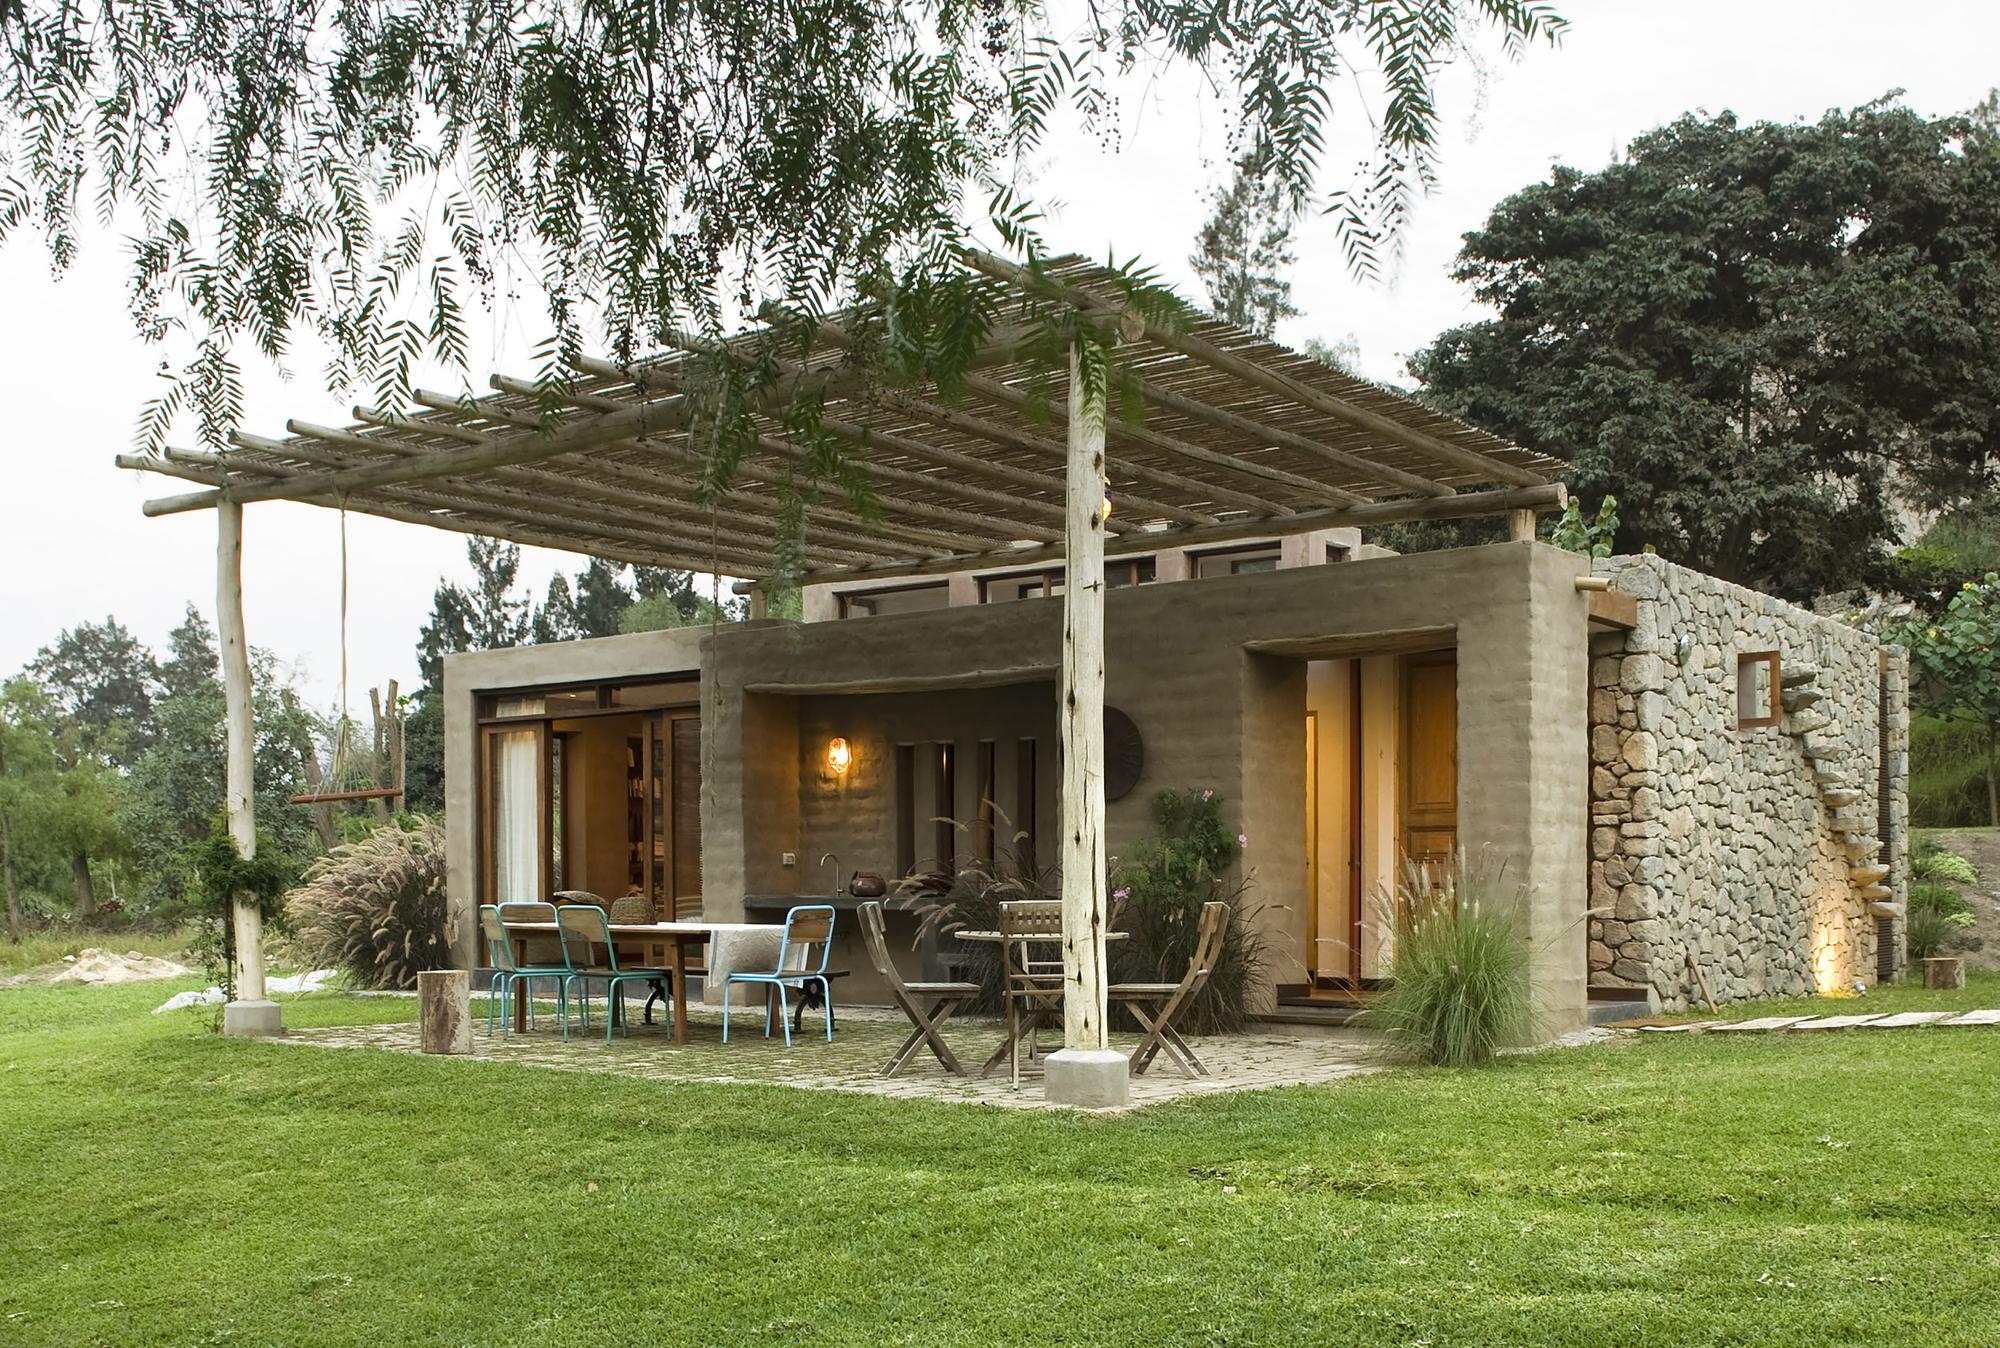 Galeria de casa chontay marina vella arquitectos 17 for Cubiertas para casas campestres